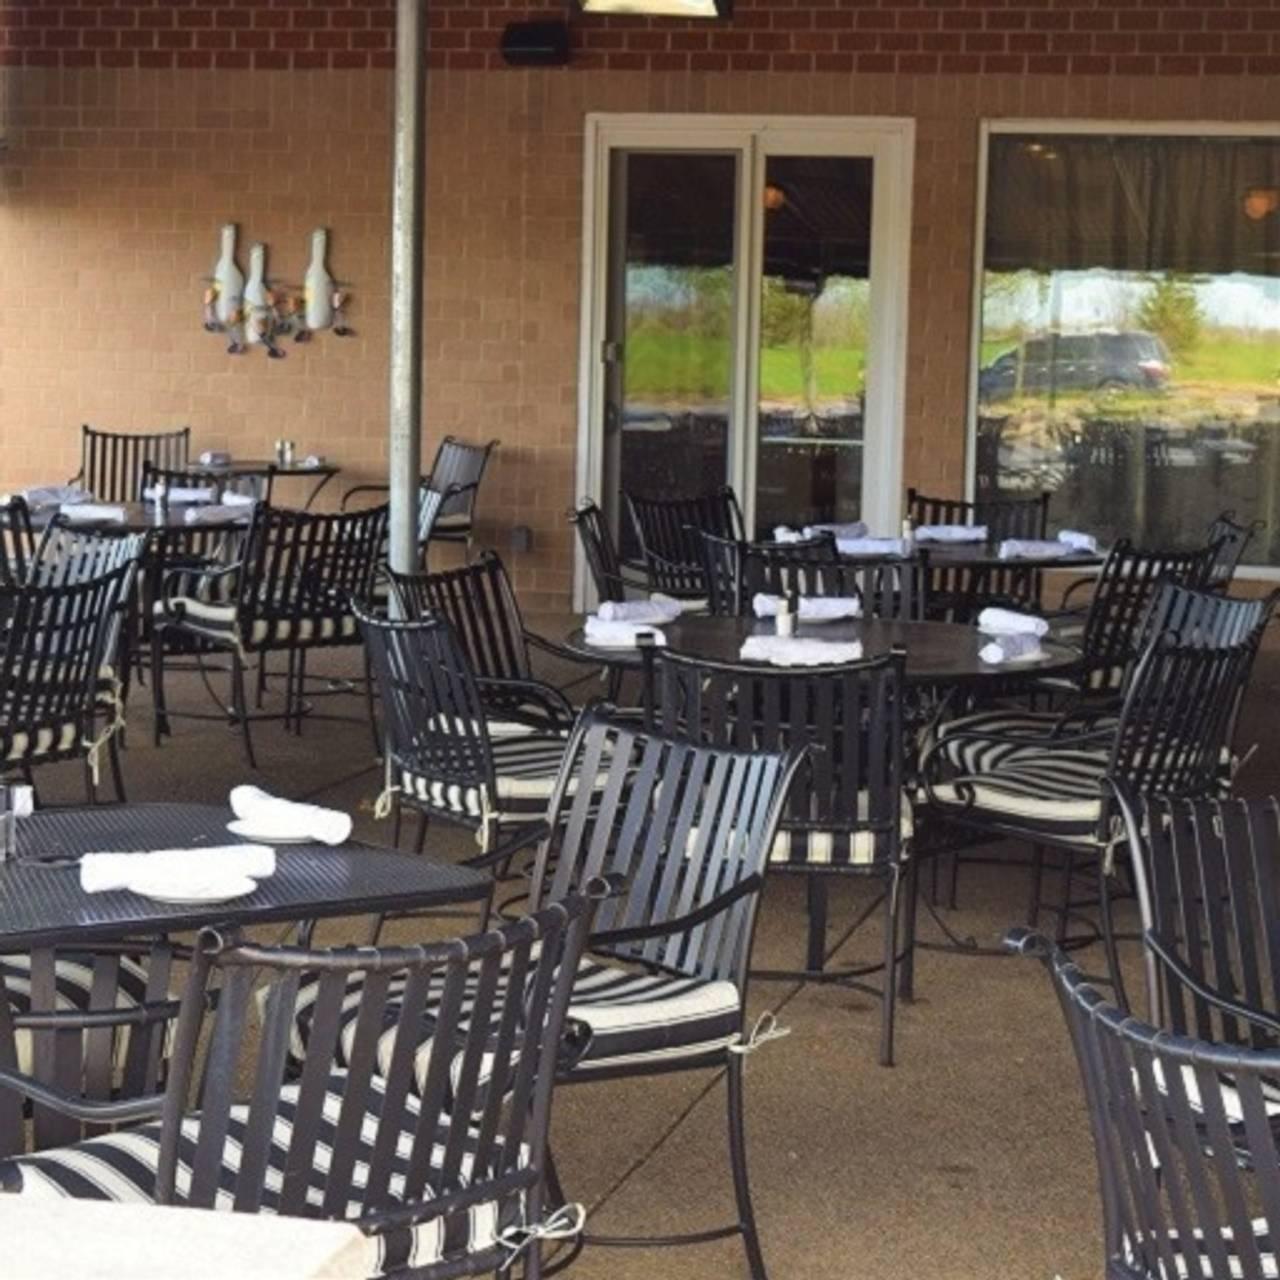 Jacksons Restaurant Rotisserie Bar Doubletree Hotel Moon Township Pa